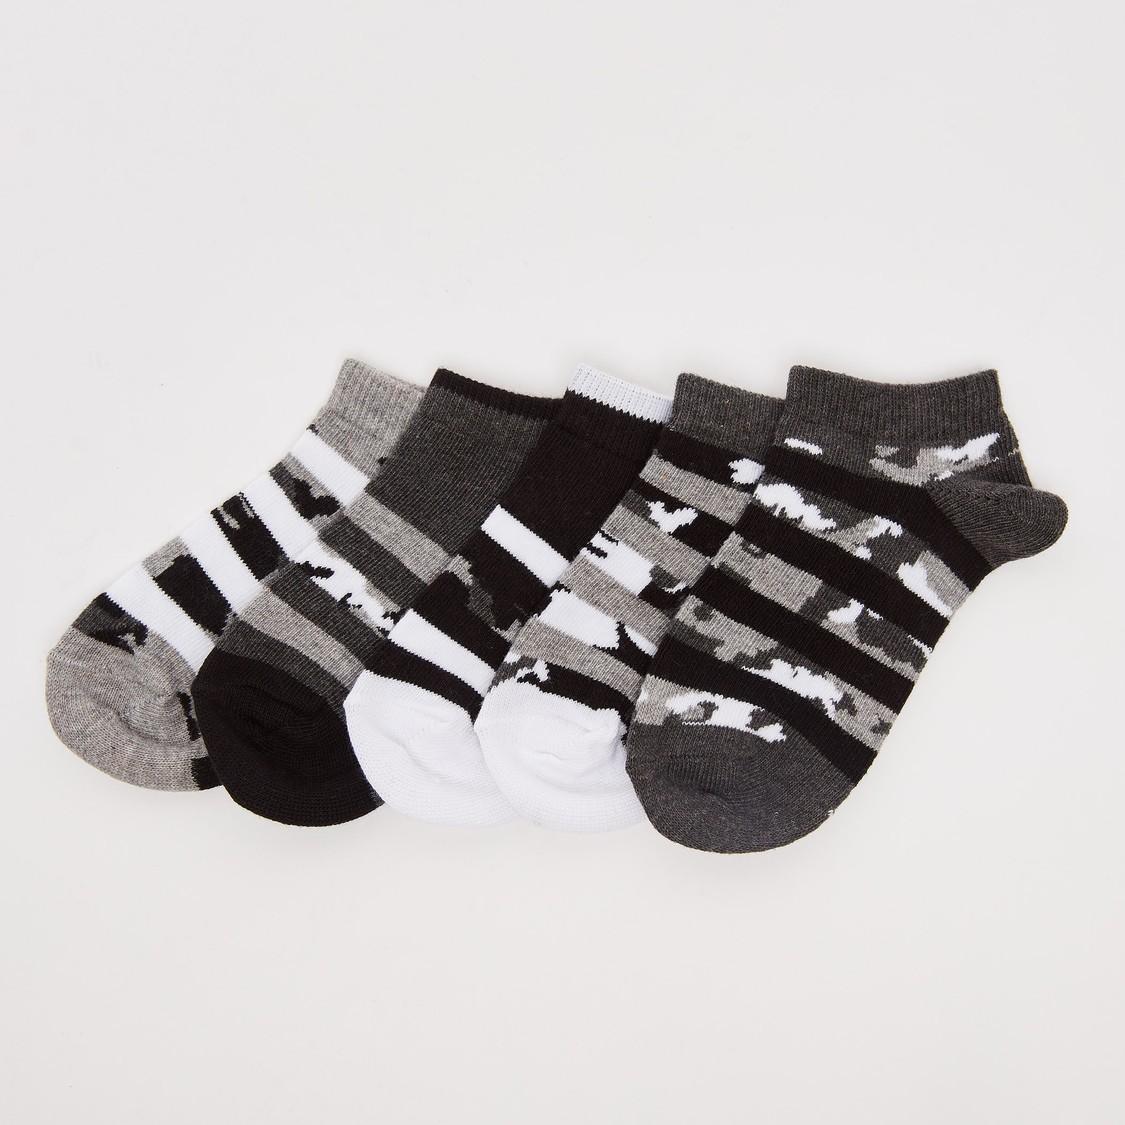 Set of 5 - Striped Socks with Camo Print